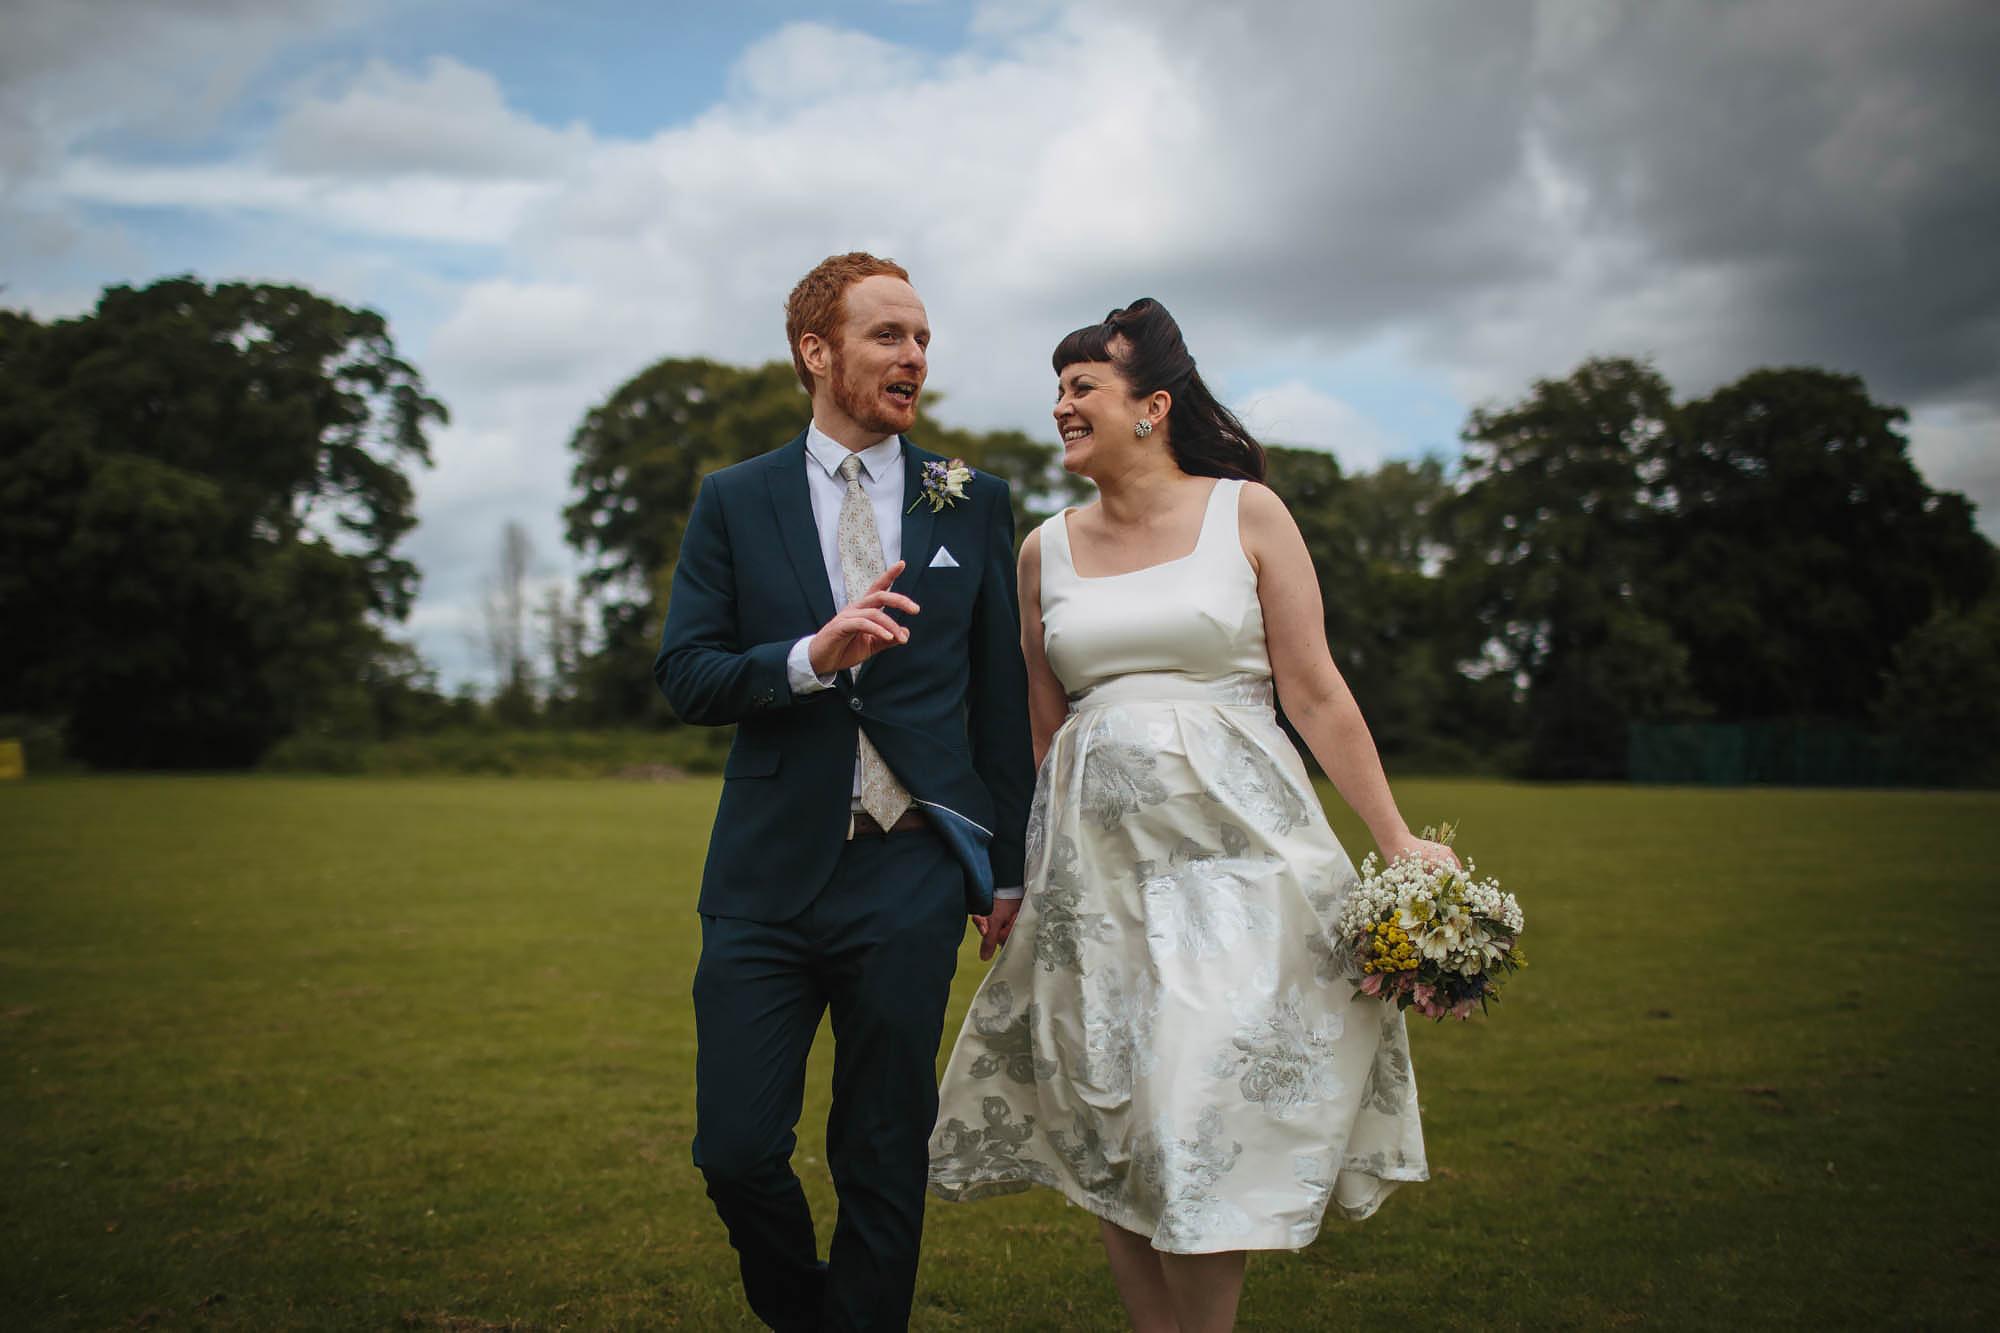 Leeds Yorkshire Wedding Photographer Laughing Portrait